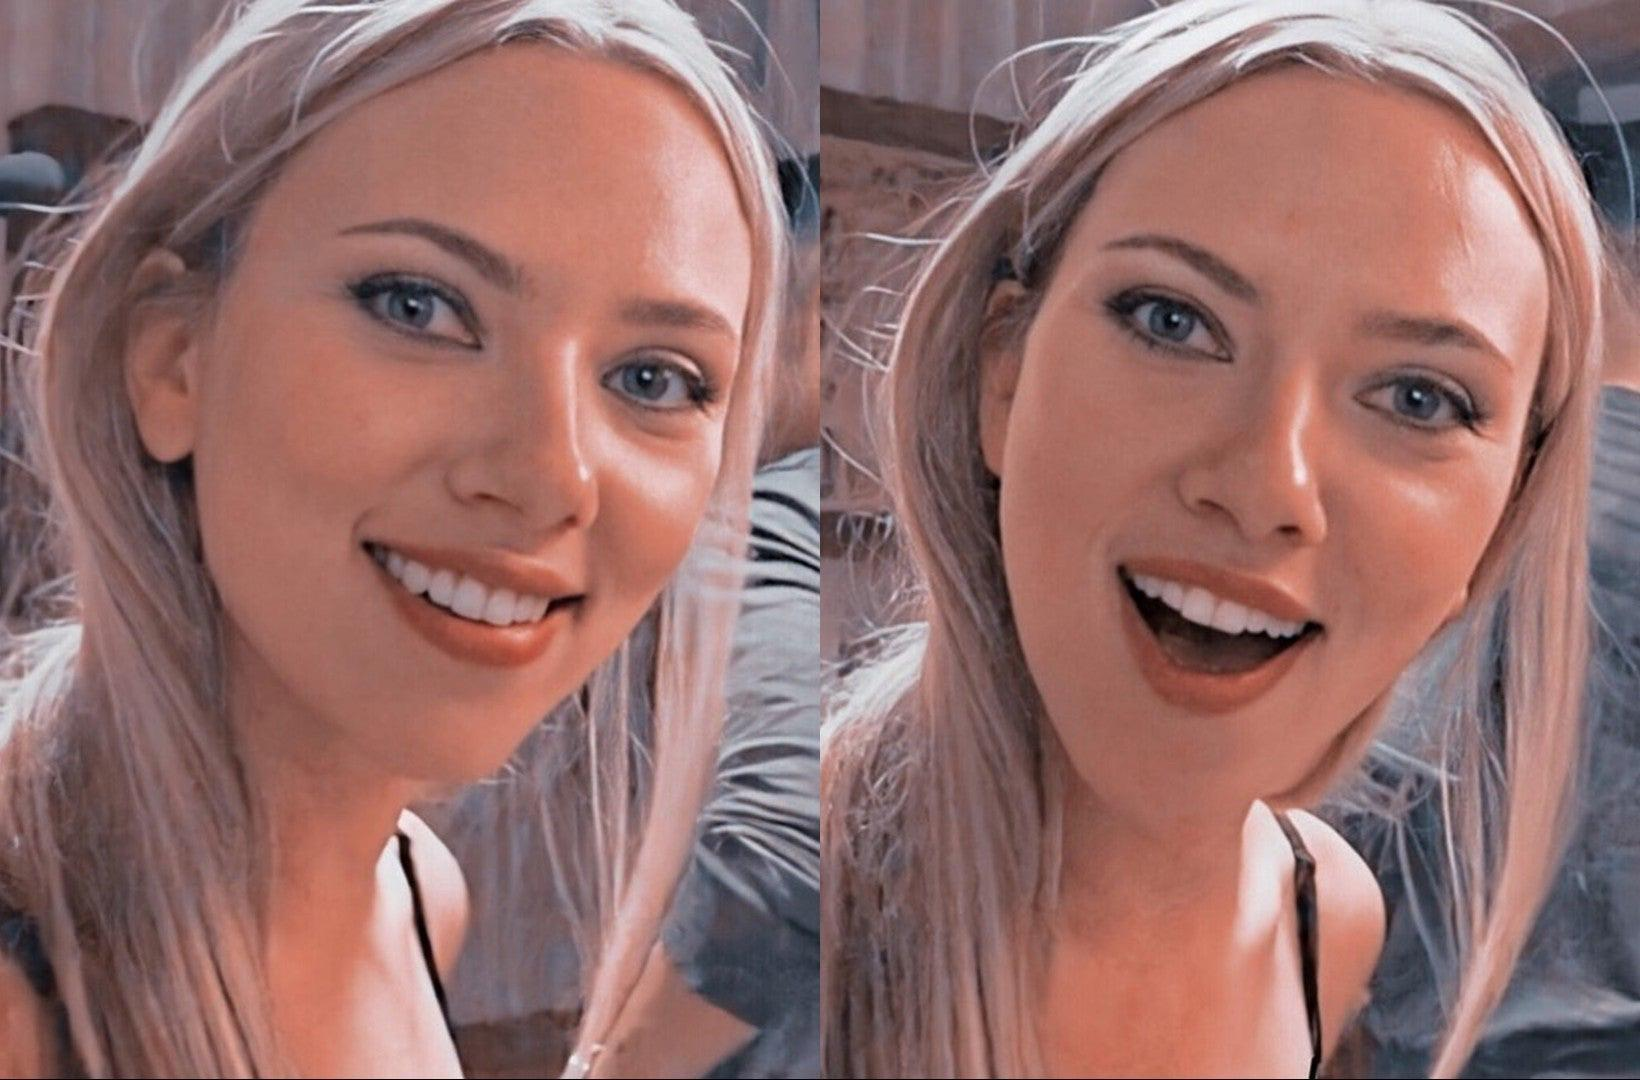 Surprised Scarlett Johansson Meme Template Surprised Scarlett Johansson Know Your Meme